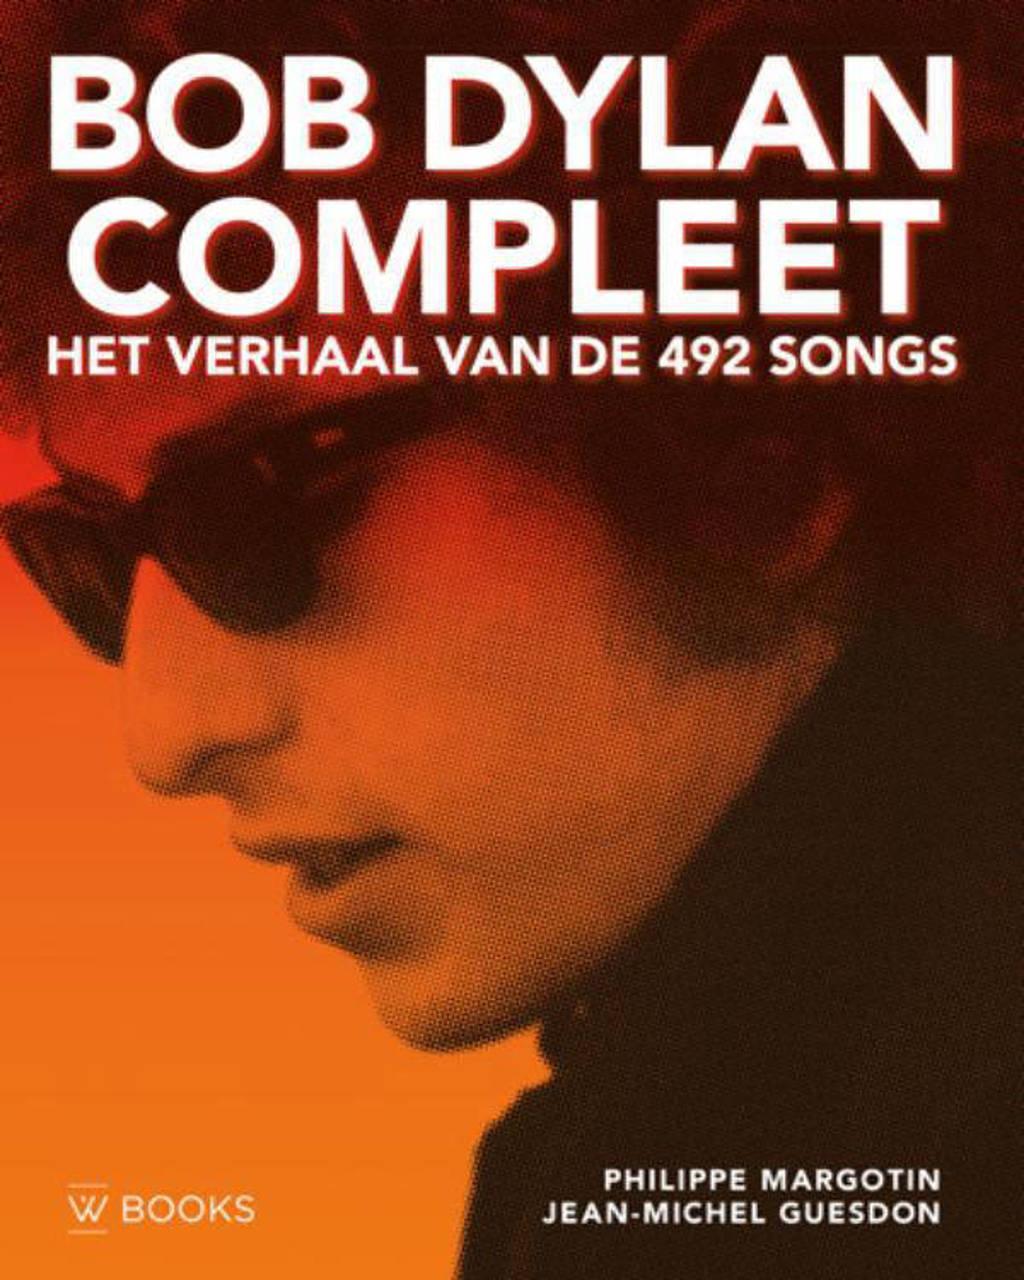 Bob Dylan compleet - Philippe Margotin en Jean-Michel Guesdon